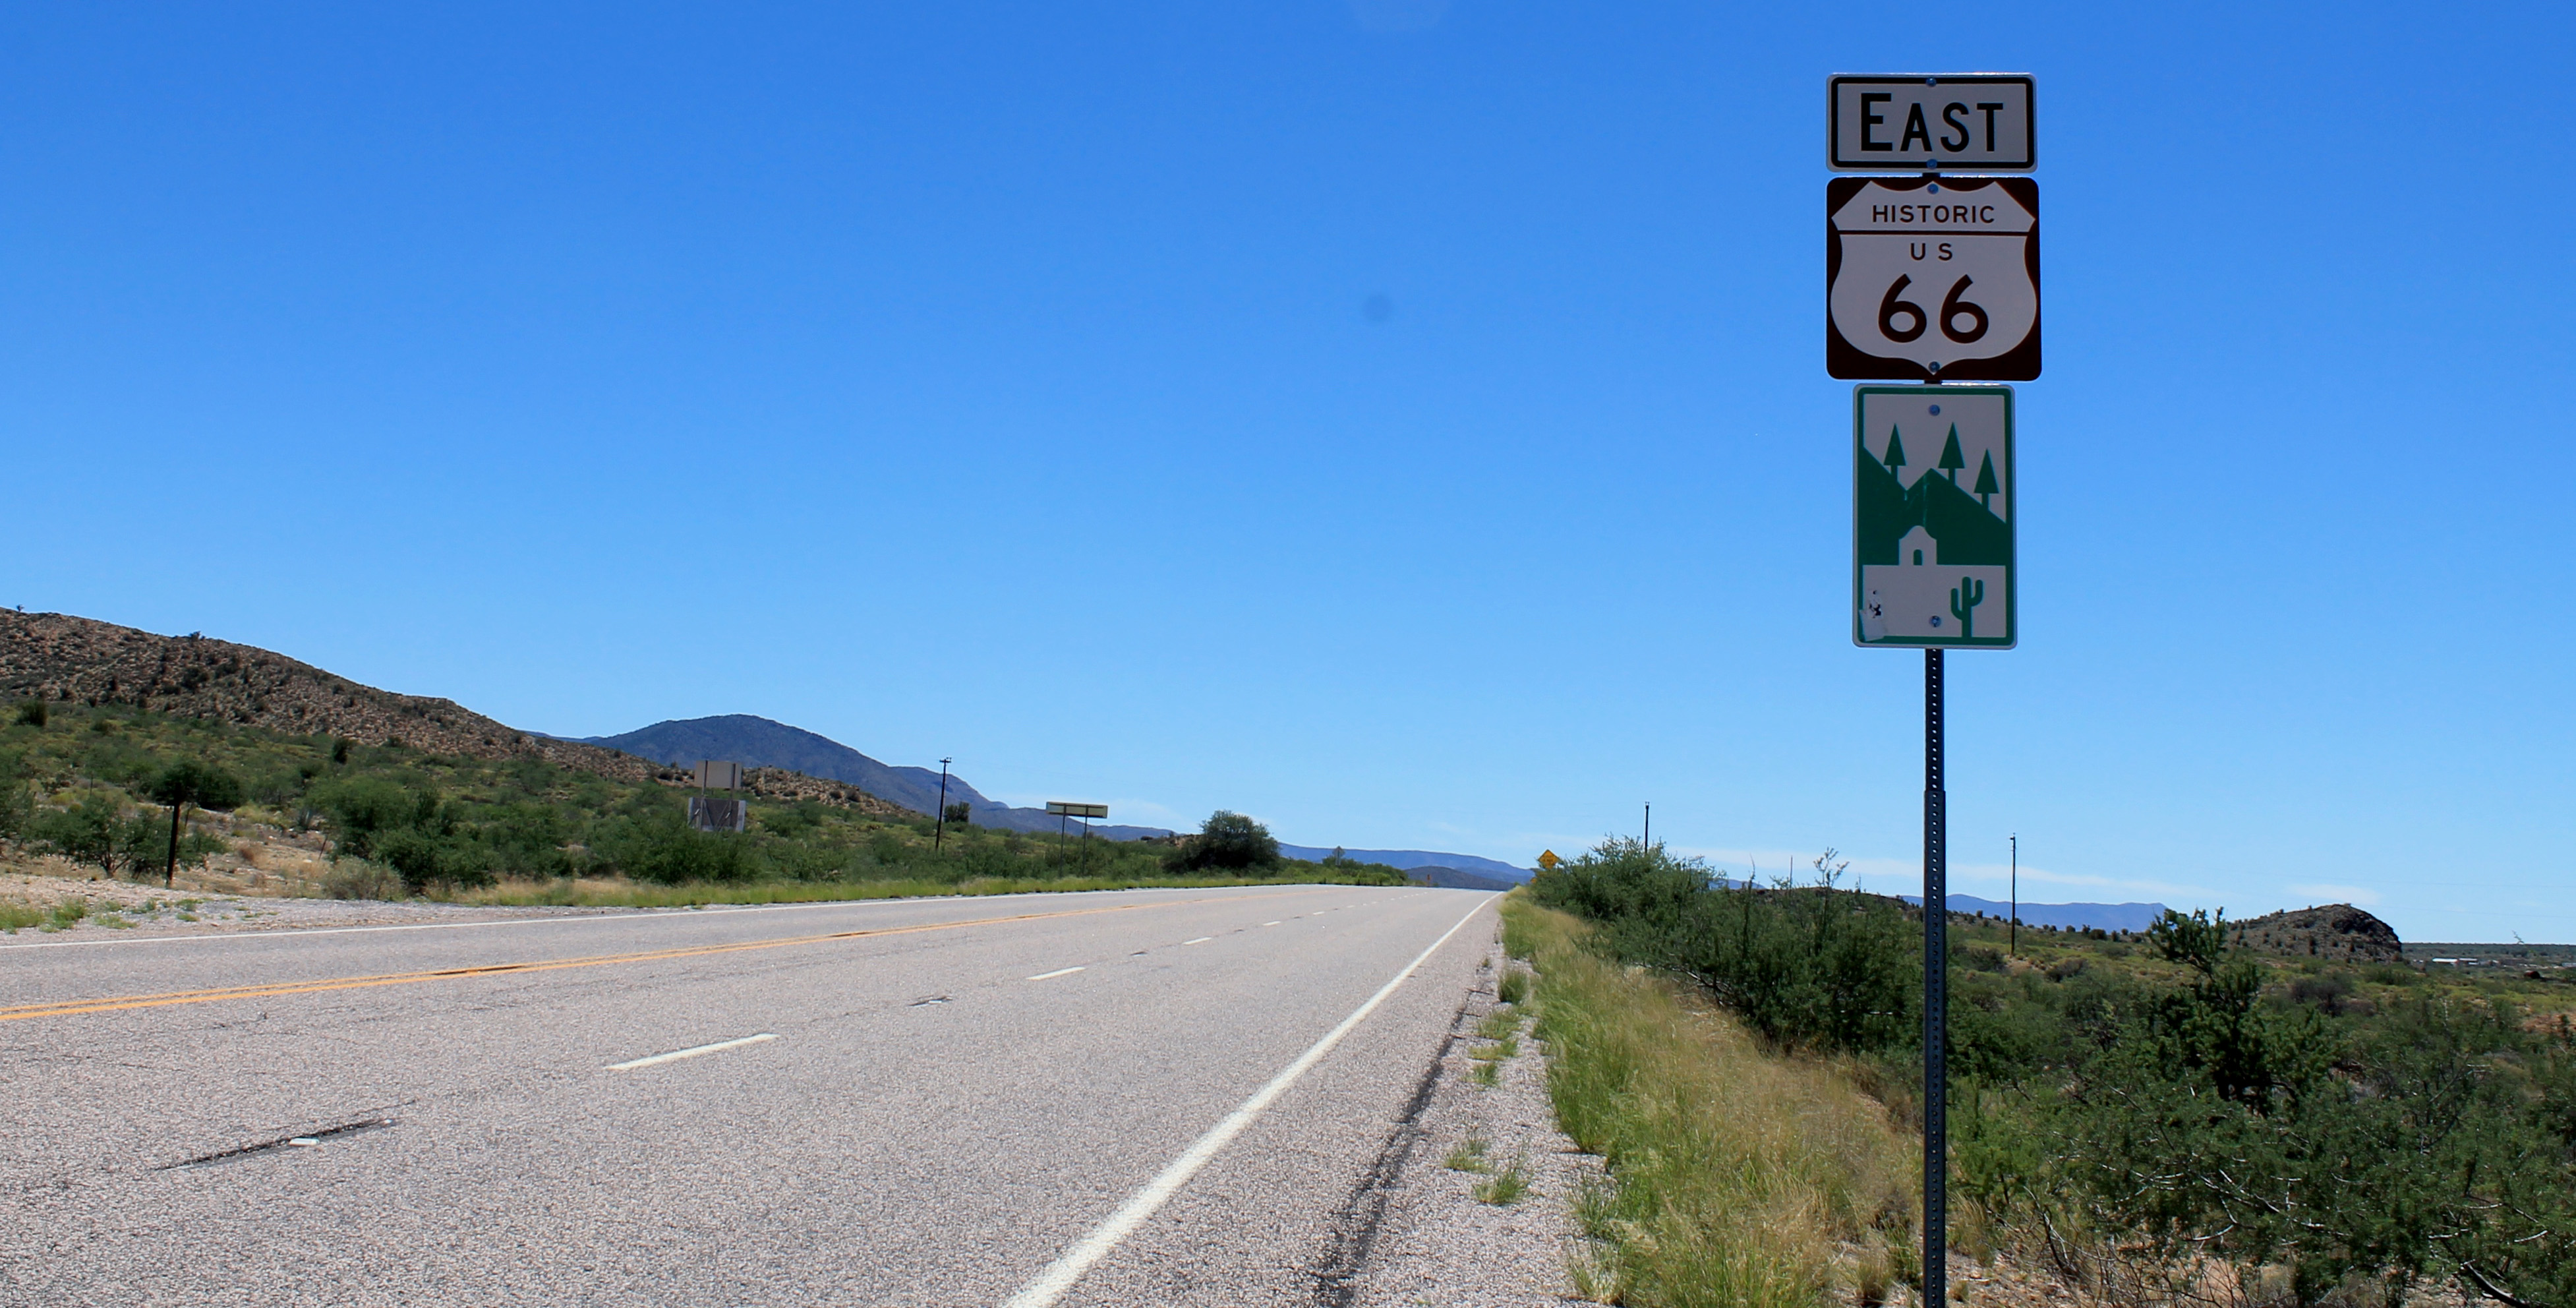 road trip  u00e0 travers la c u00f4te ouest des usa au d u00e9part de montr u00e9al